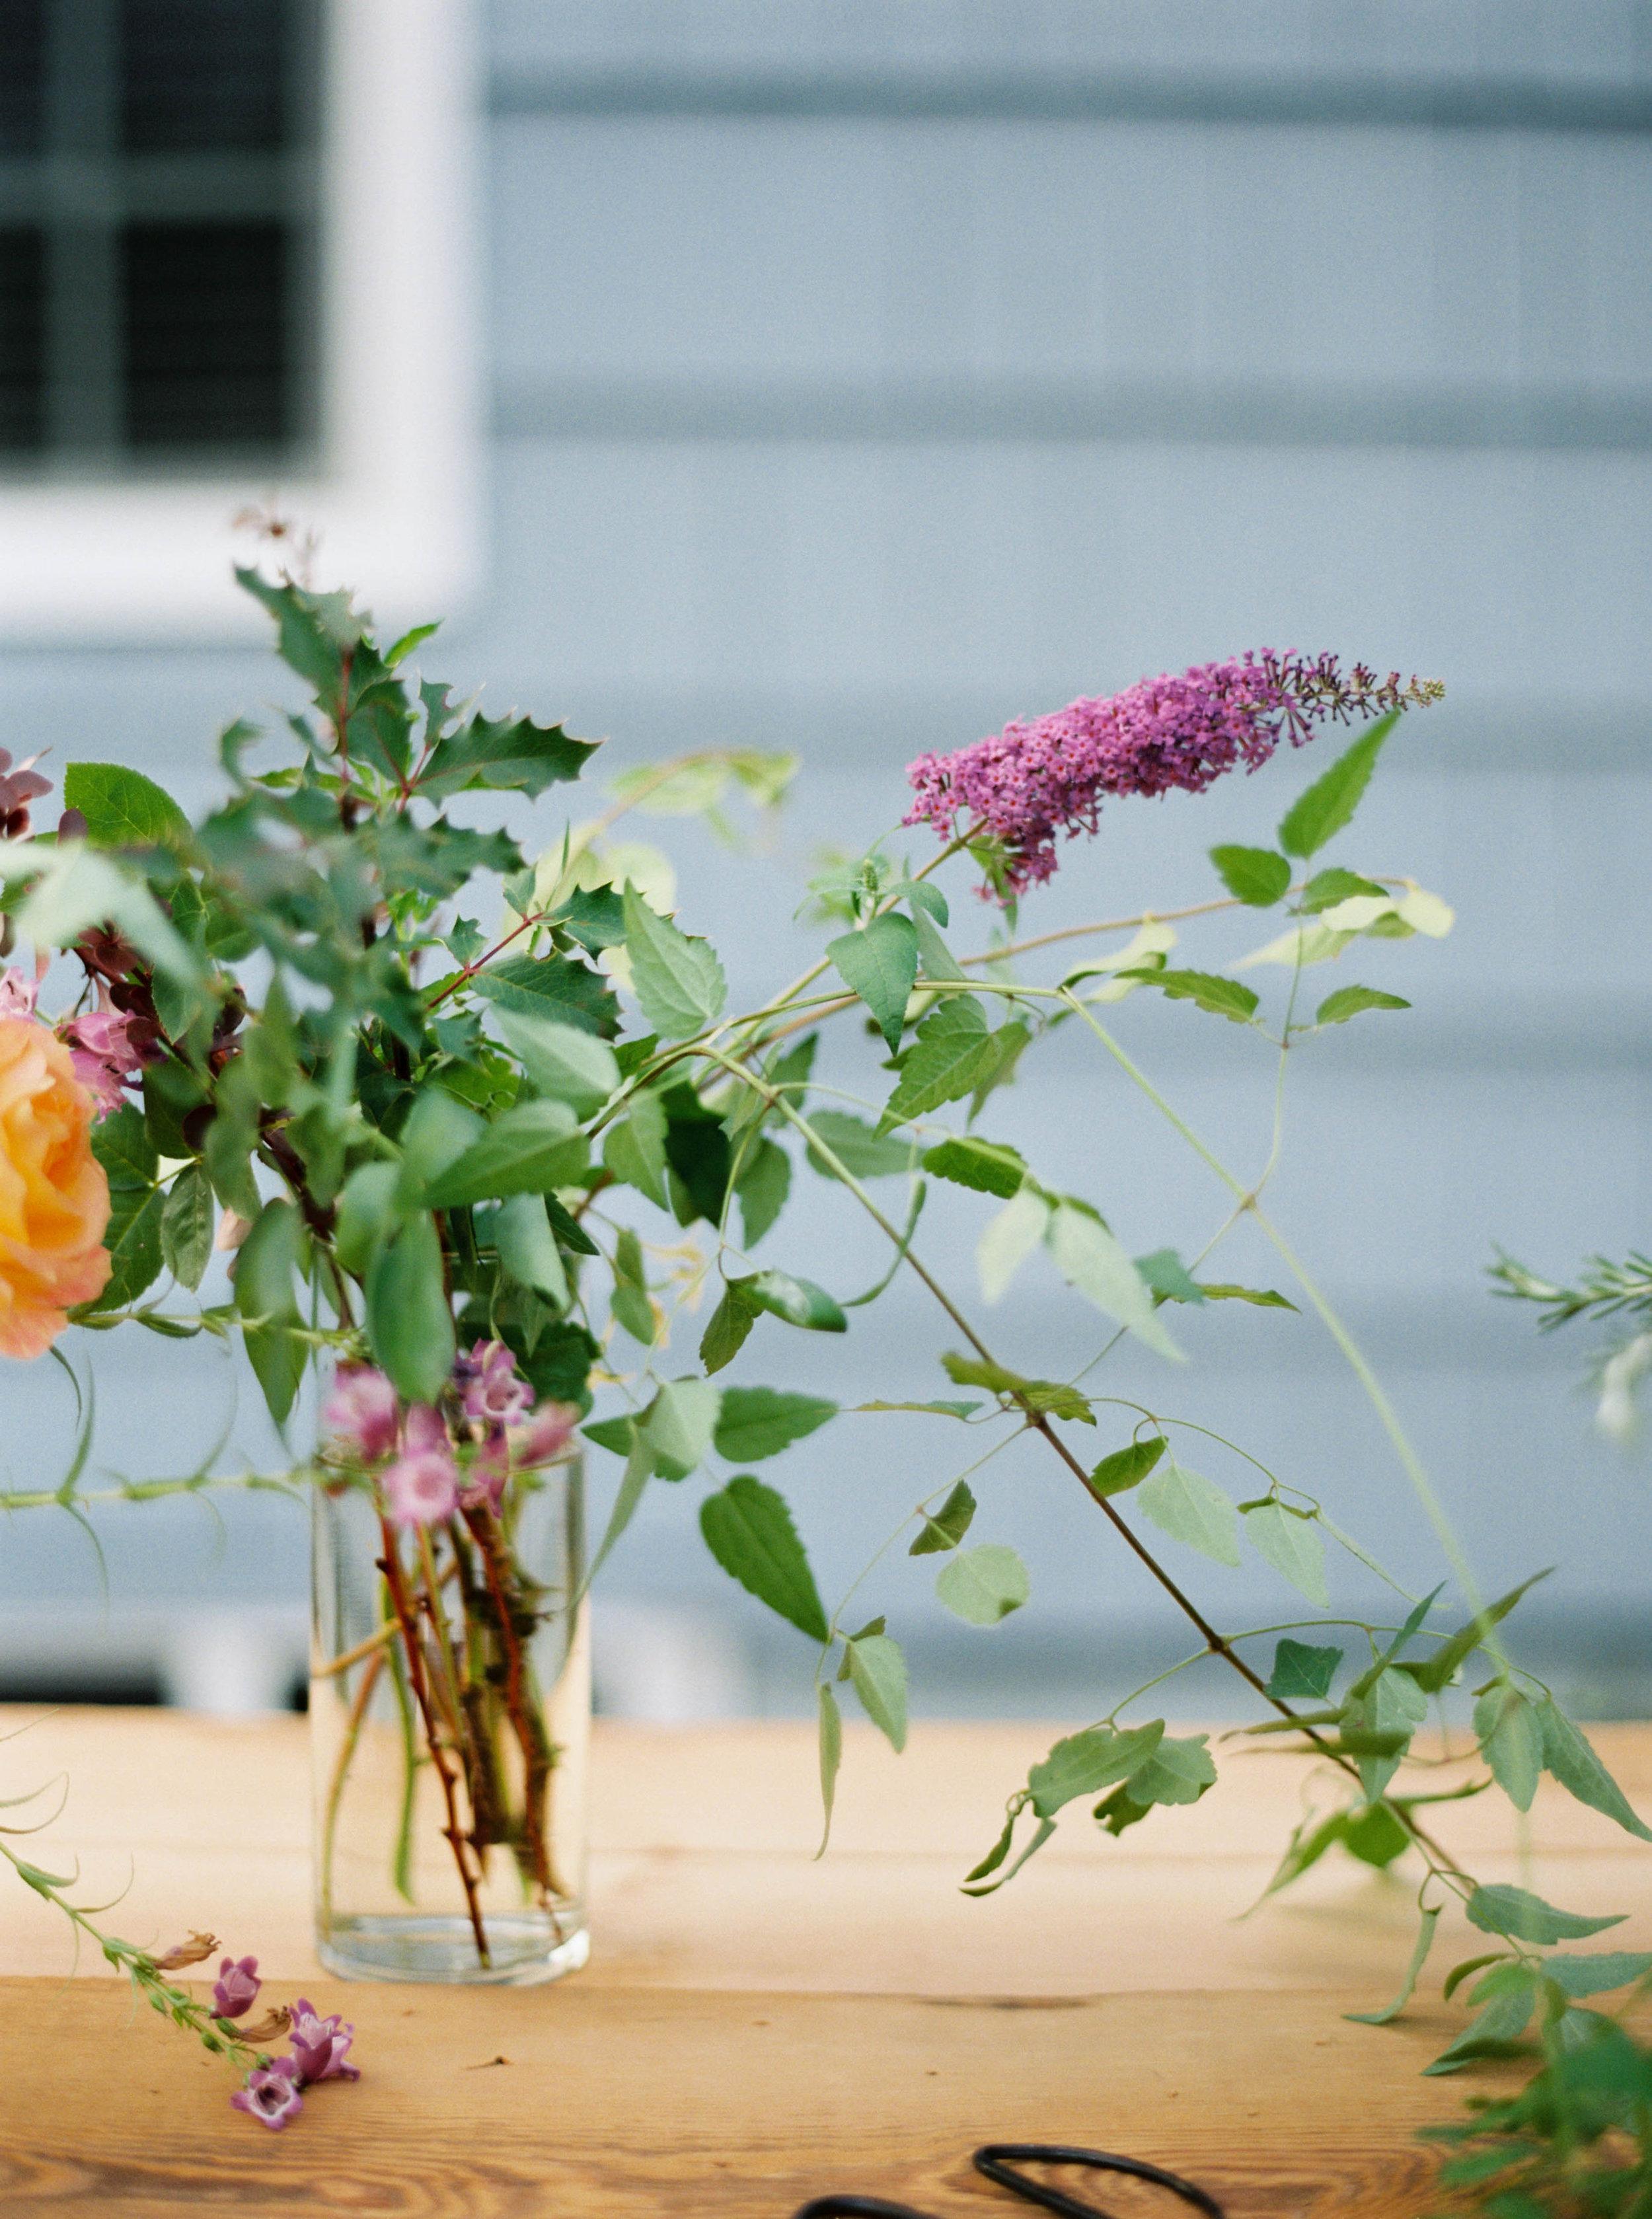 foraged flower bouquet from livingforaged.com